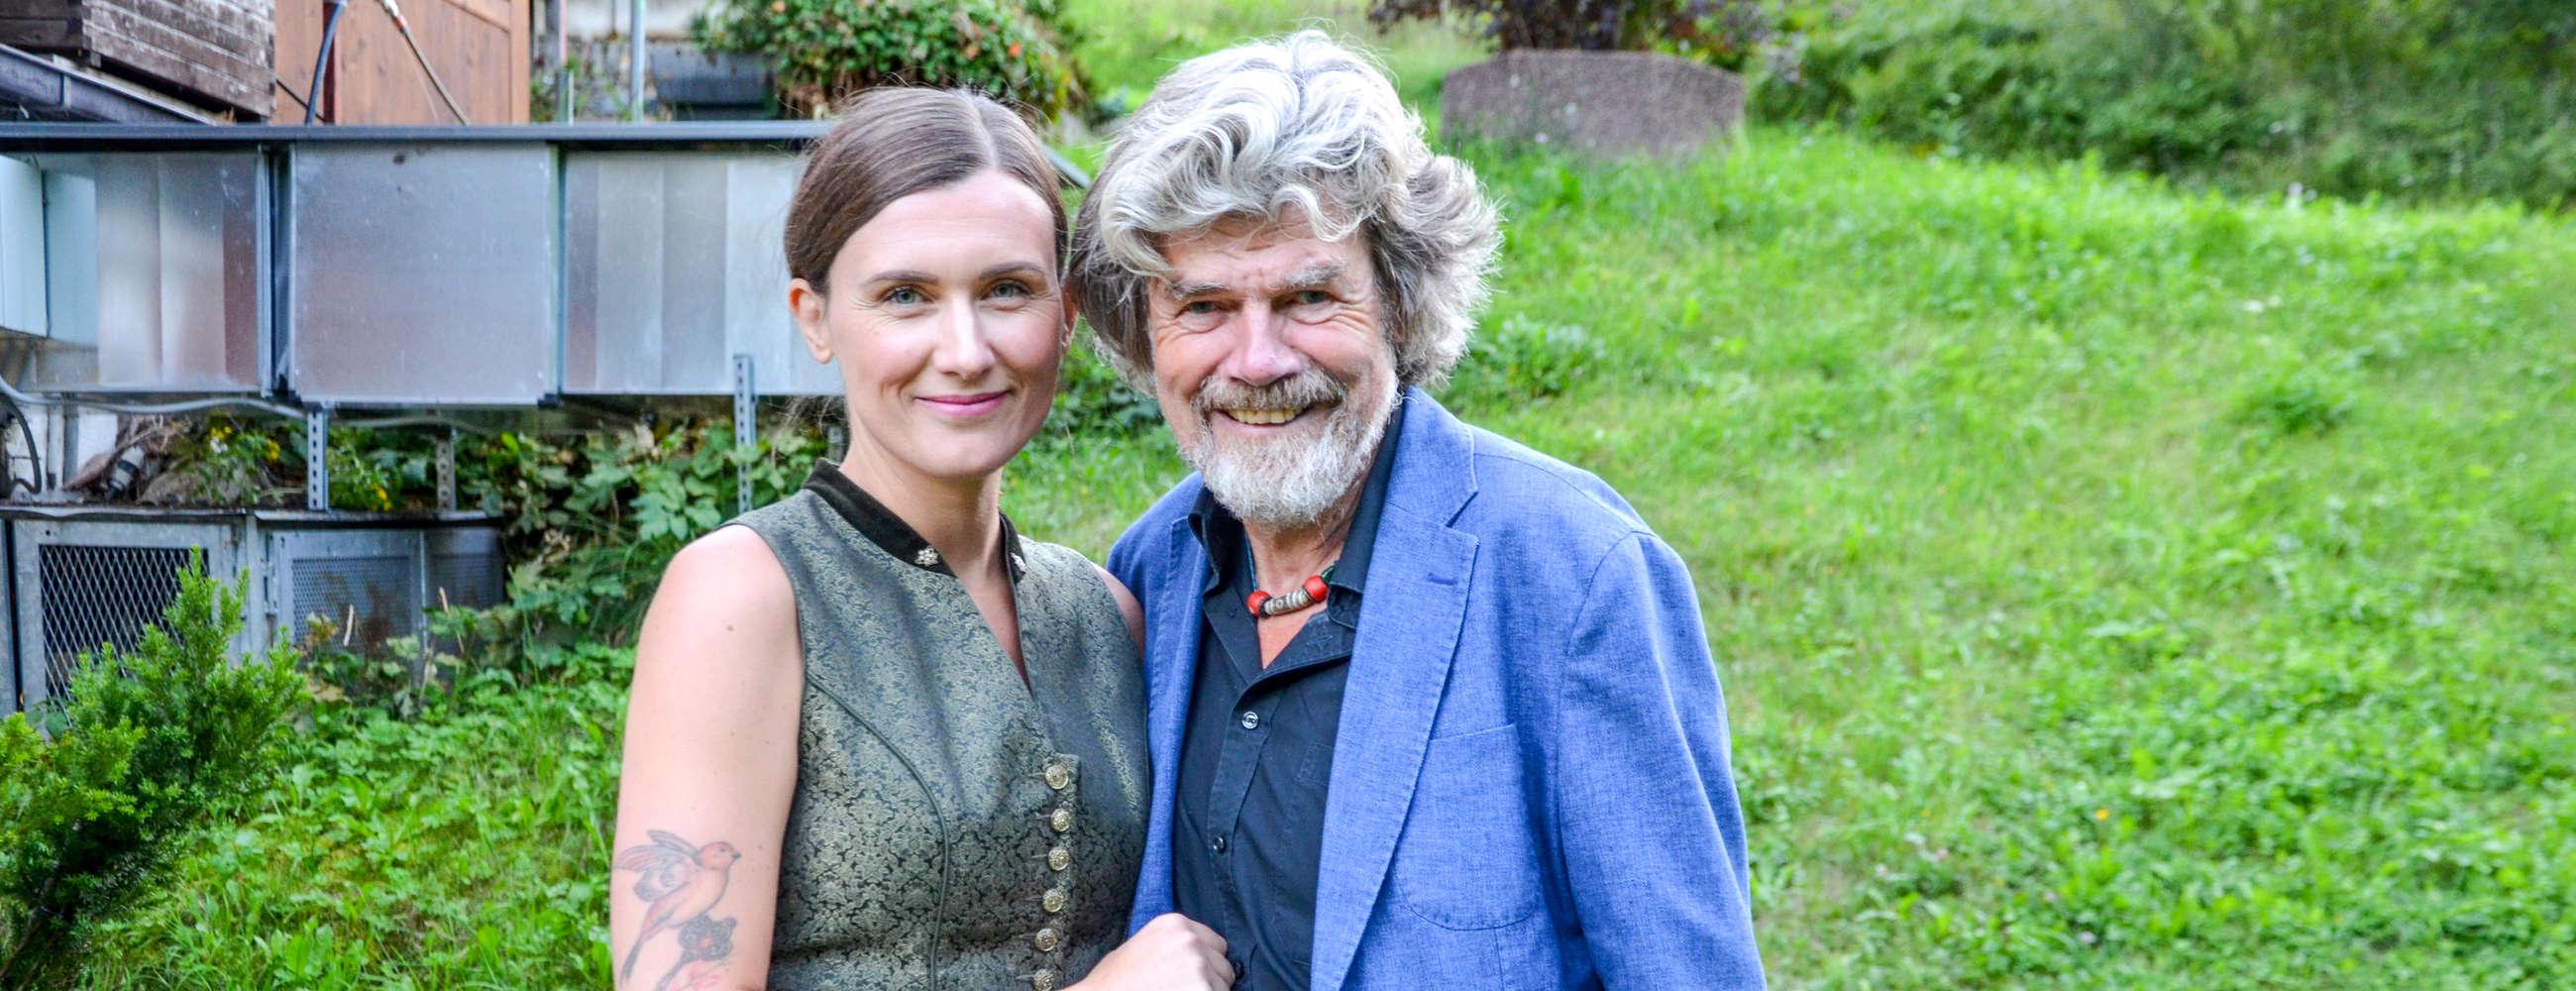 Reinhold Messner Neue Freundin